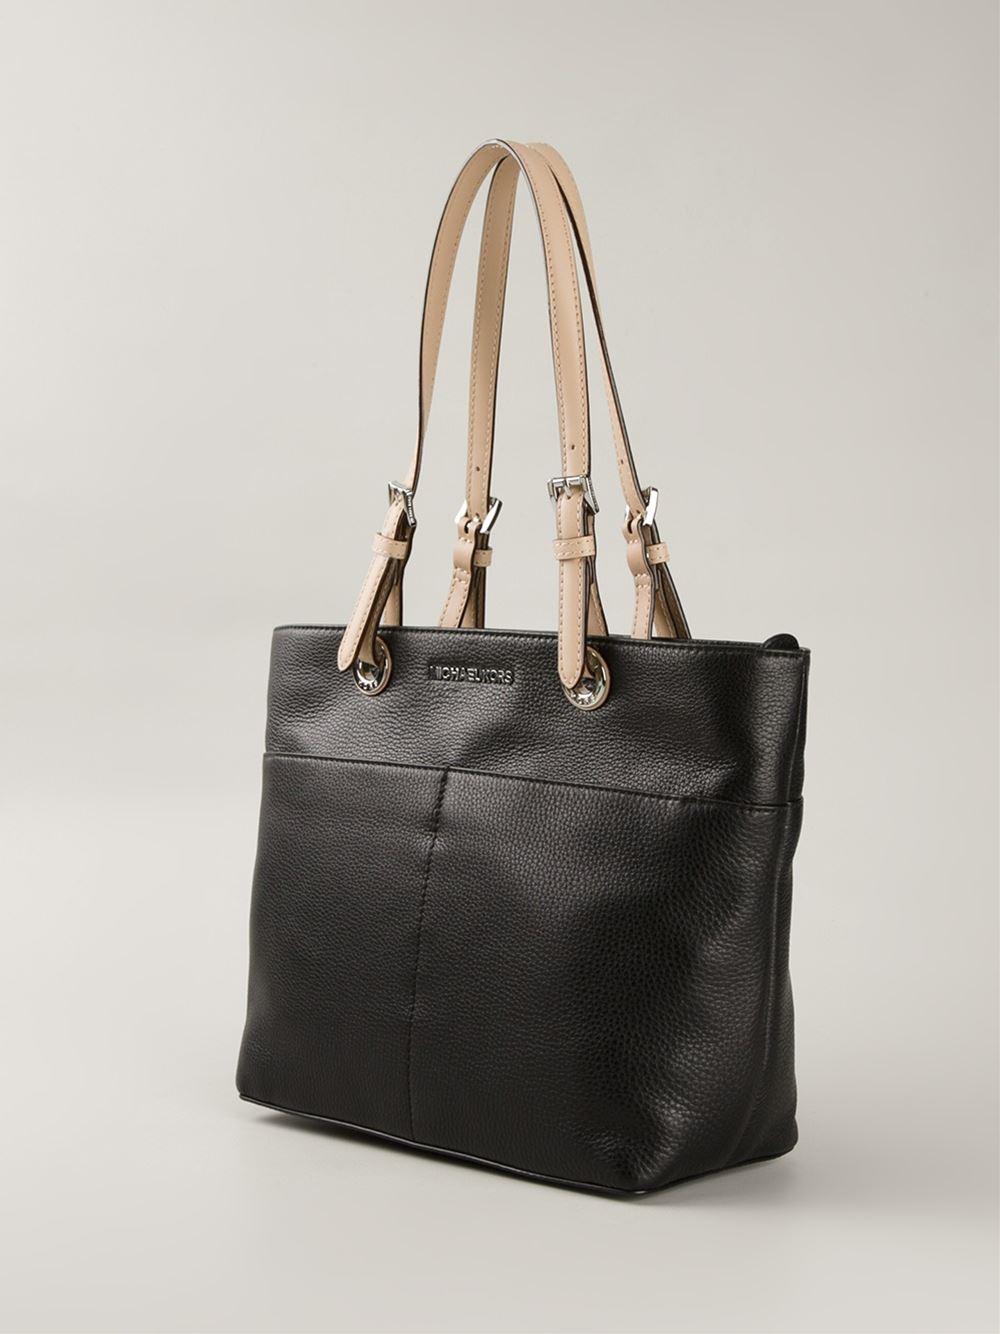 2ed982cb701d ... shopping lyst michael michael kors bedford tote bag in black bb028 a313d